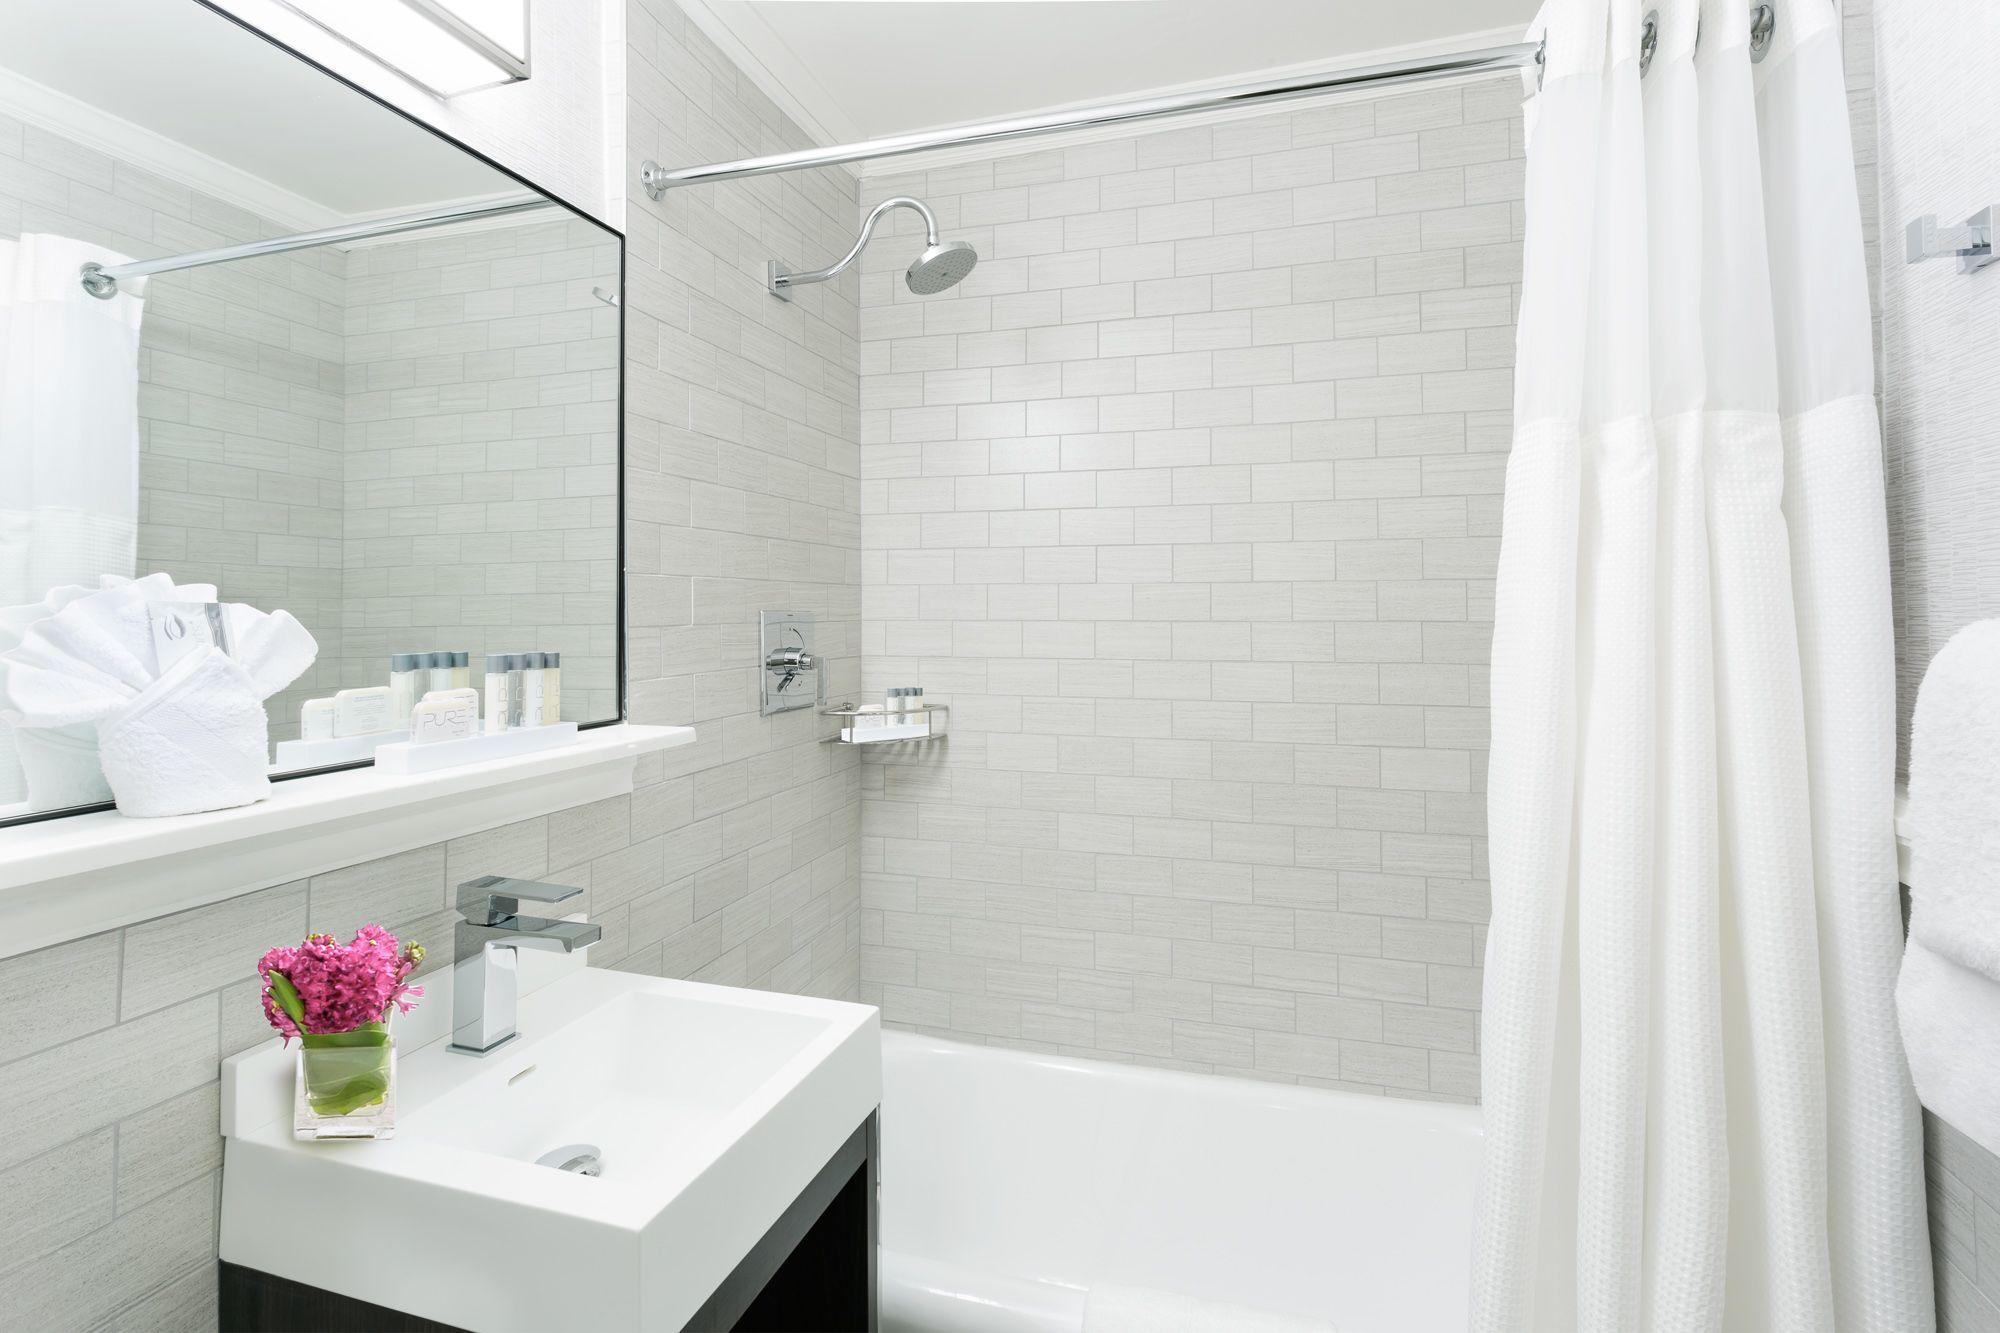 Guestroom Bathroom At Boston Park Plaza Luxury Hotel Stylish Room Hotel